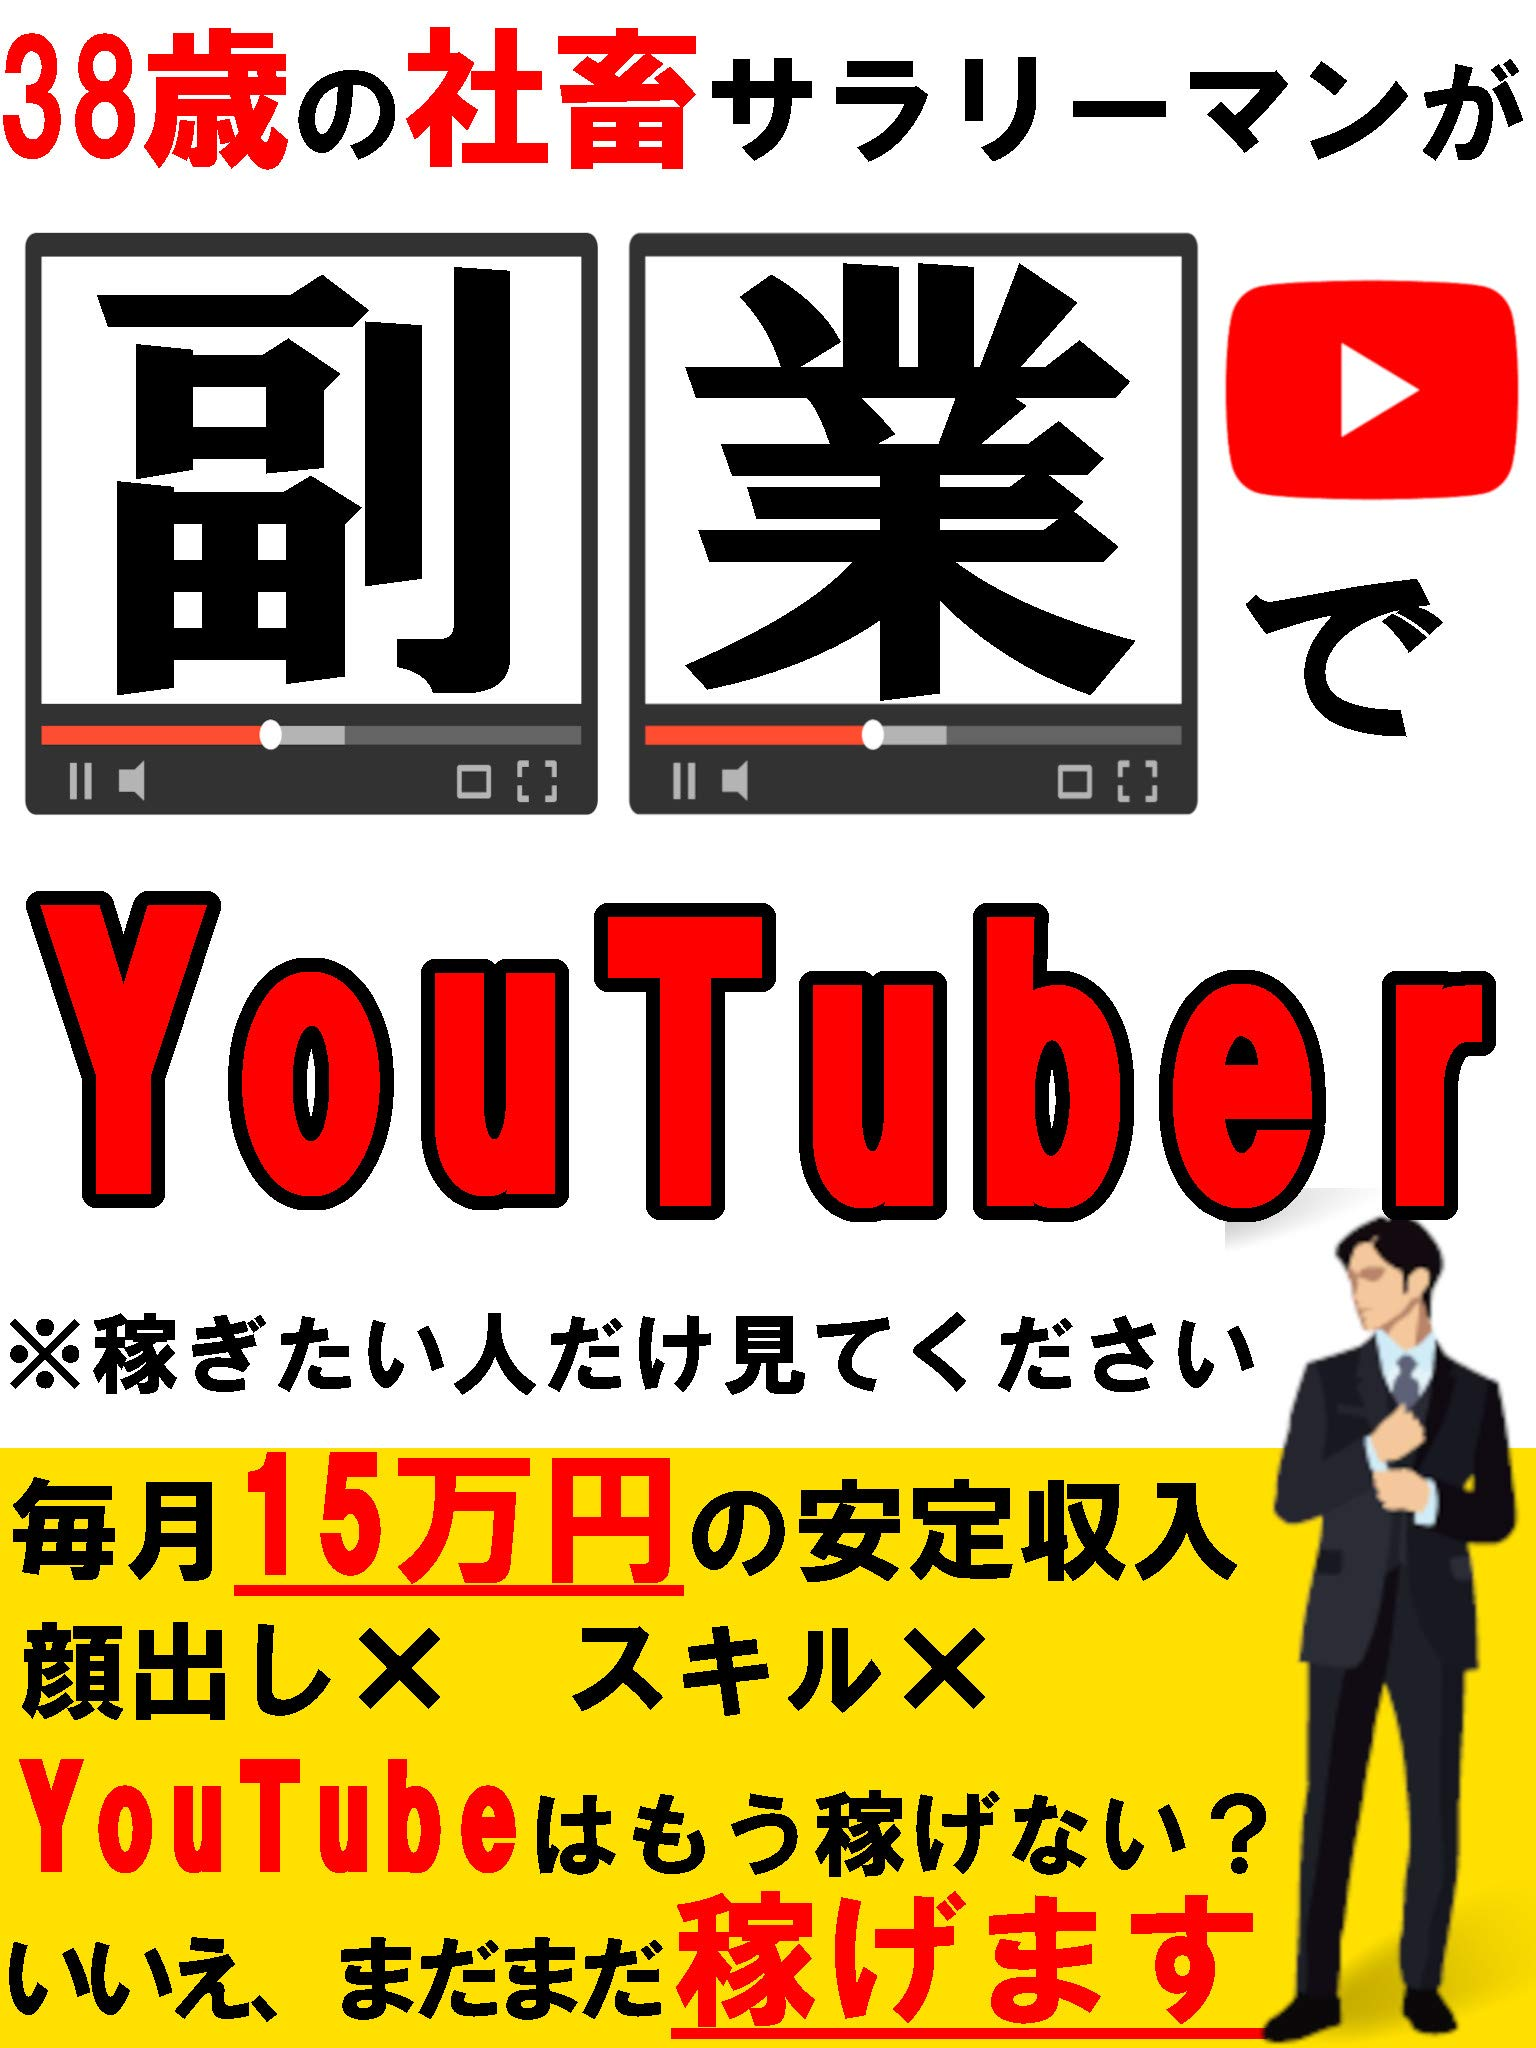 sannzyuuhassainosyatikugasarari-manngahukugyoudeyoutuber (Japanese Edition)